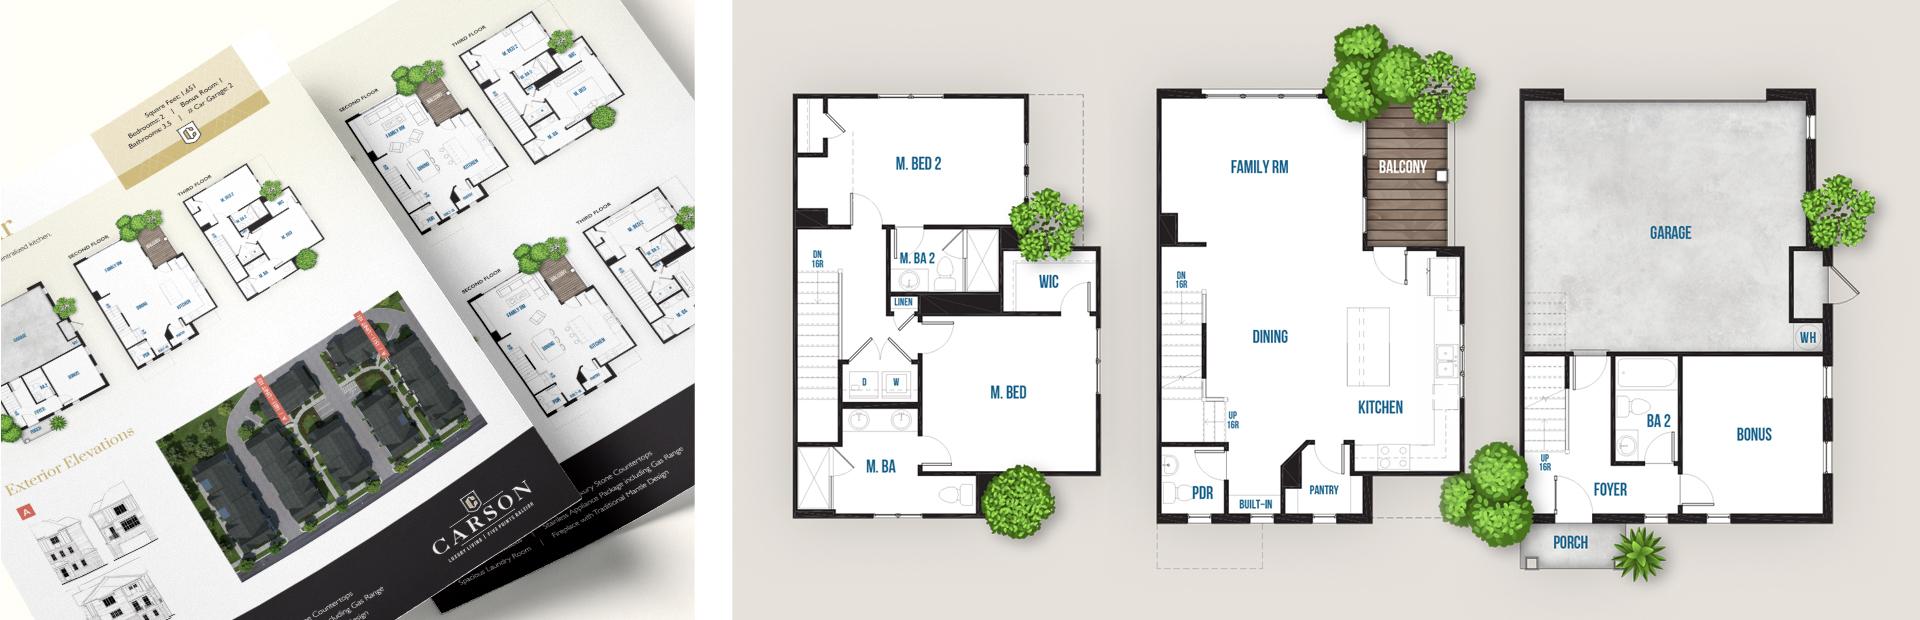 Compass Pointe - Print Marketing by Springer Studios, Wilmington, NC